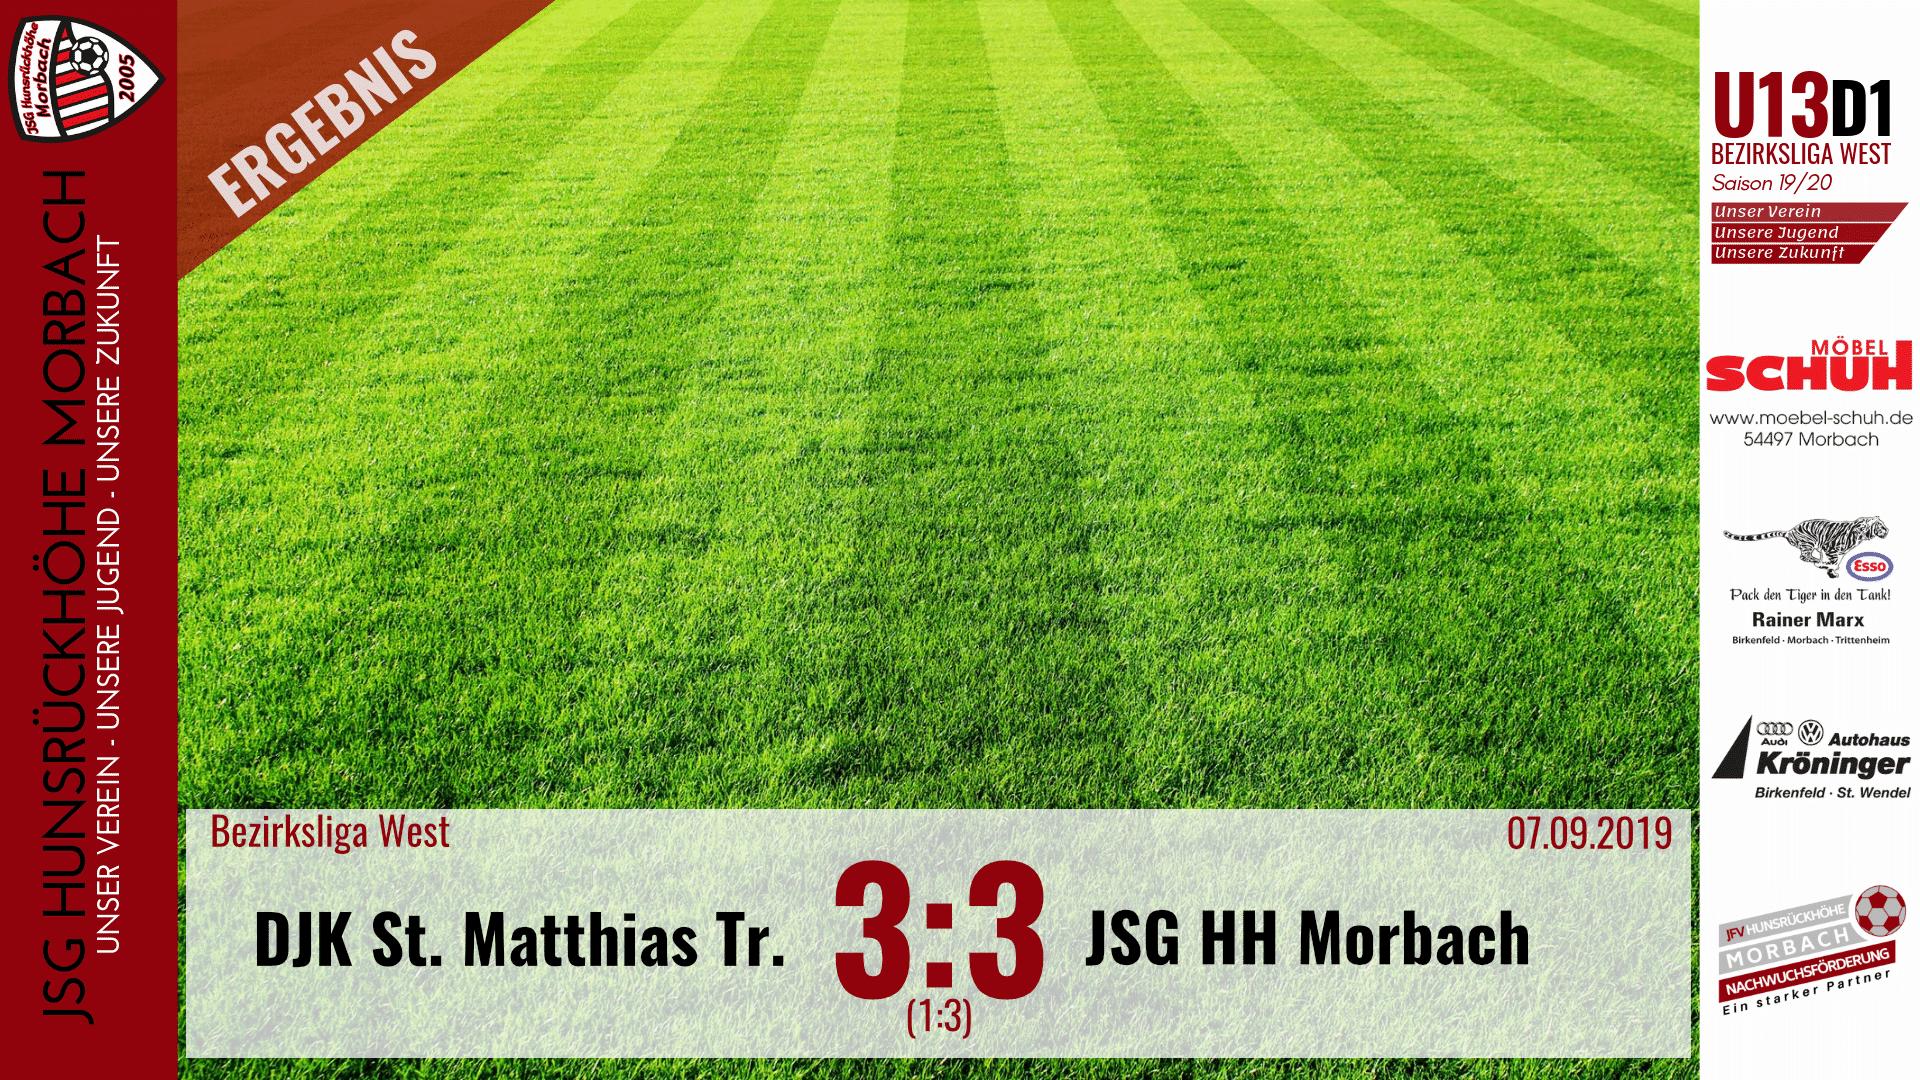 U13 D1: DJK St. Matthias Trier – JSG Hunsrückhöhe Morbach 3:3 (1:3)